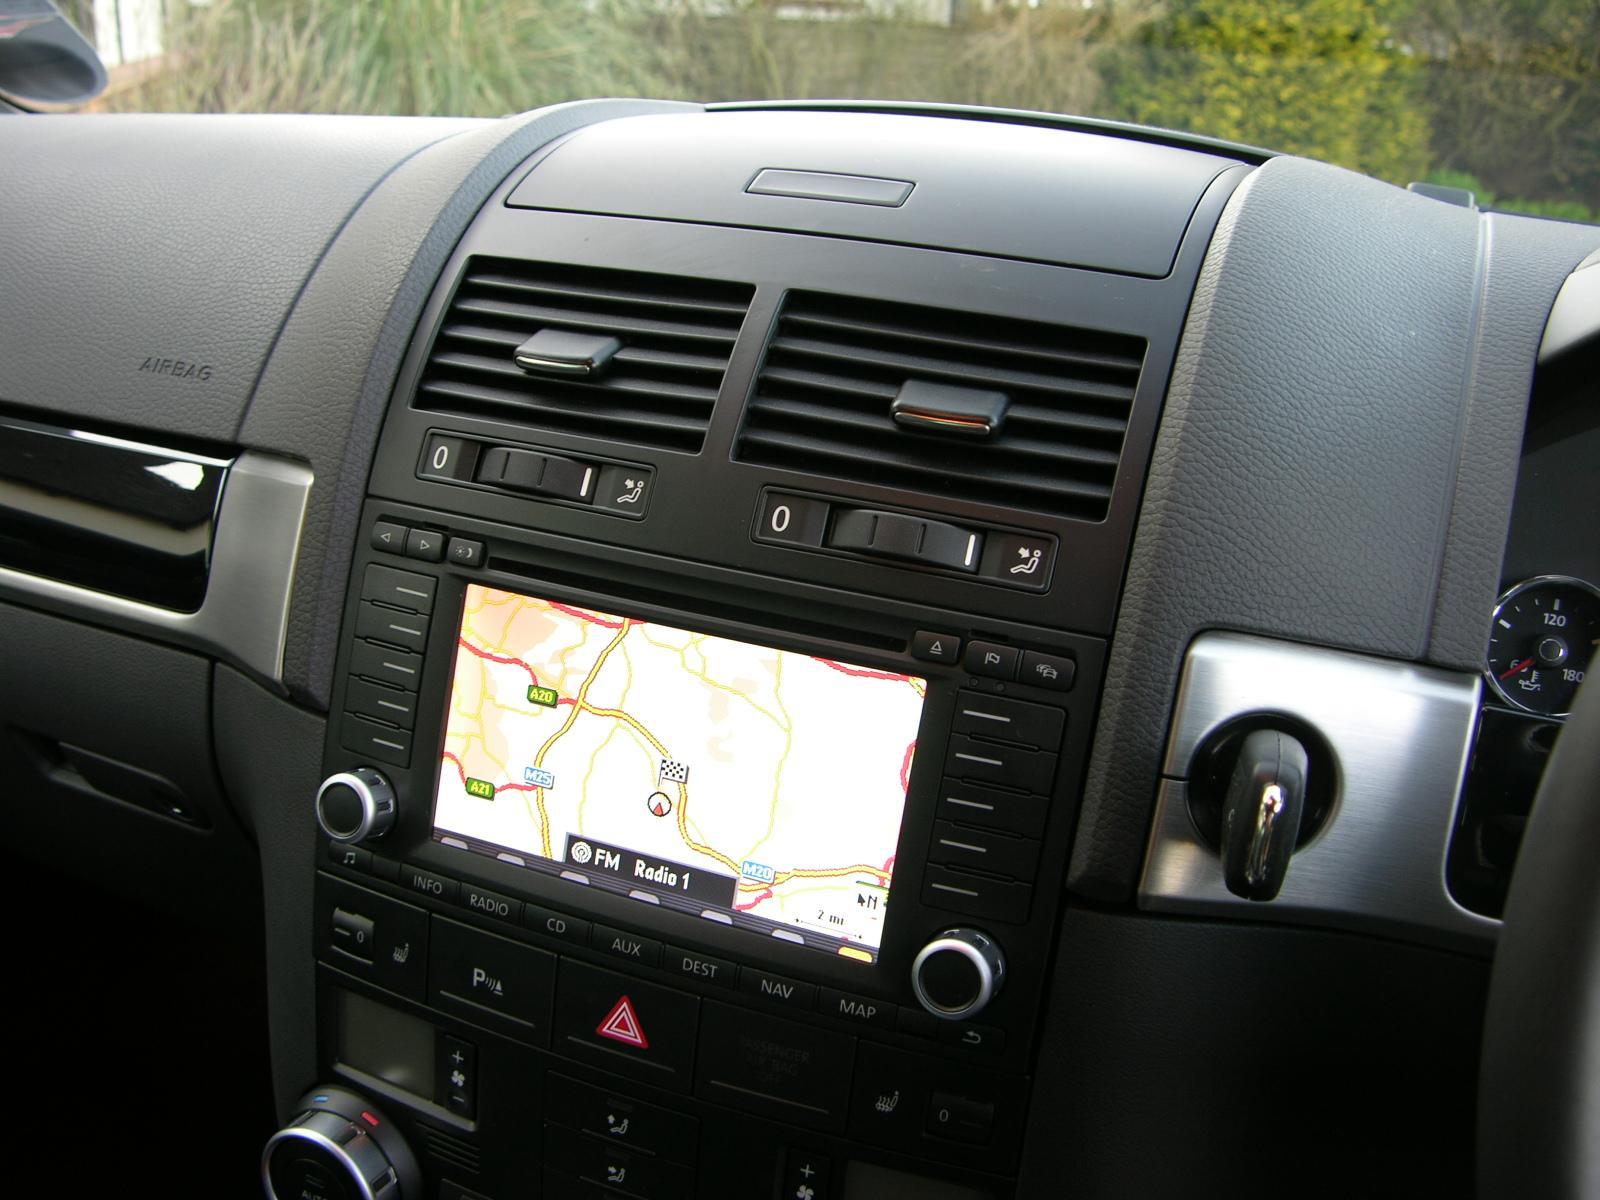 file vw touareg 2 5 tdi se flickr the car spy 3 jpg wikimedia commons. Black Bedroom Furniture Sets. Home Design Ideas